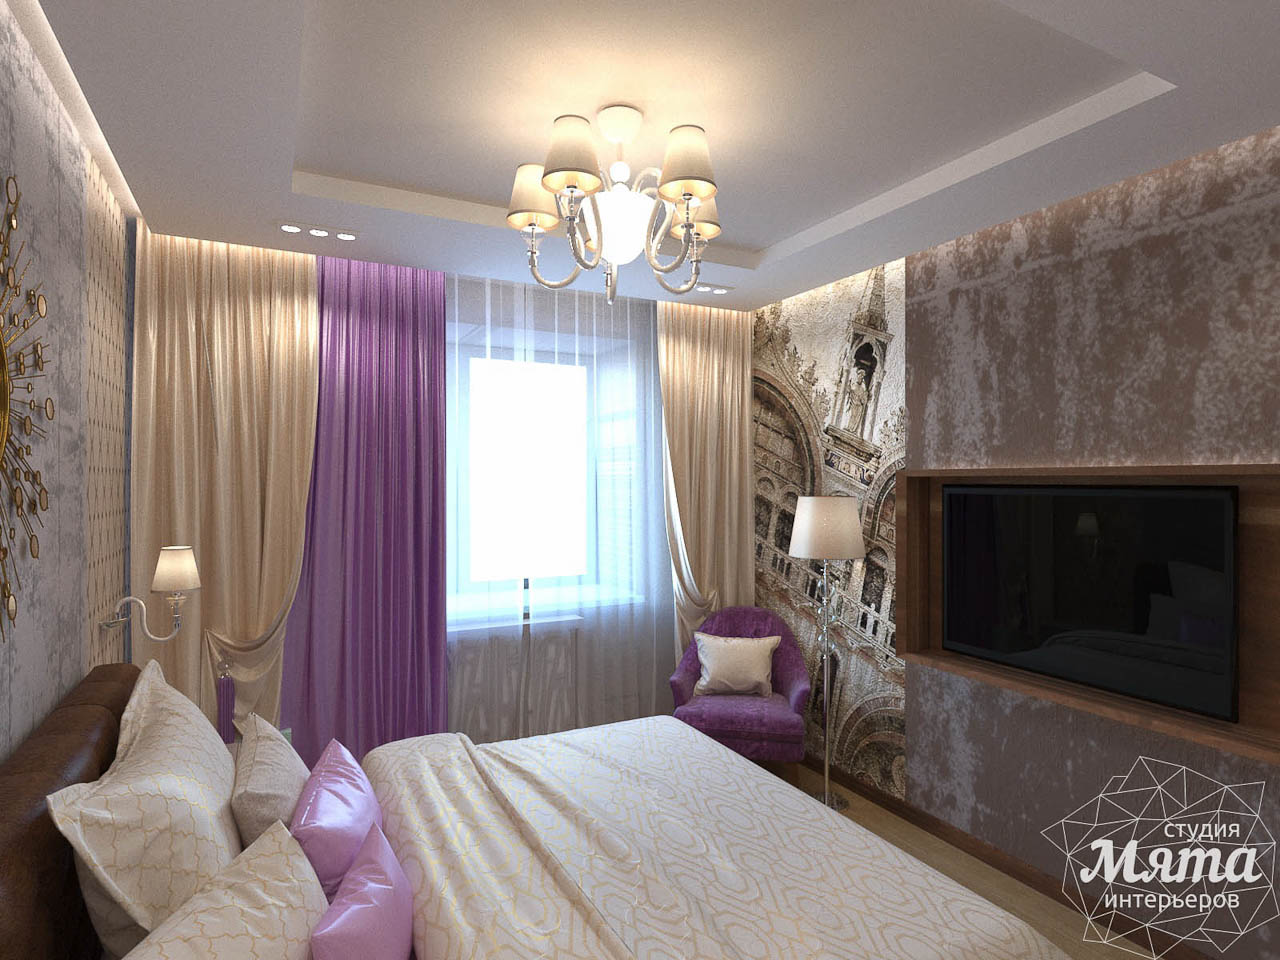 Дизайн интерьера трехкомнатной квартиры по ул. Мельникова 27 img1058473005